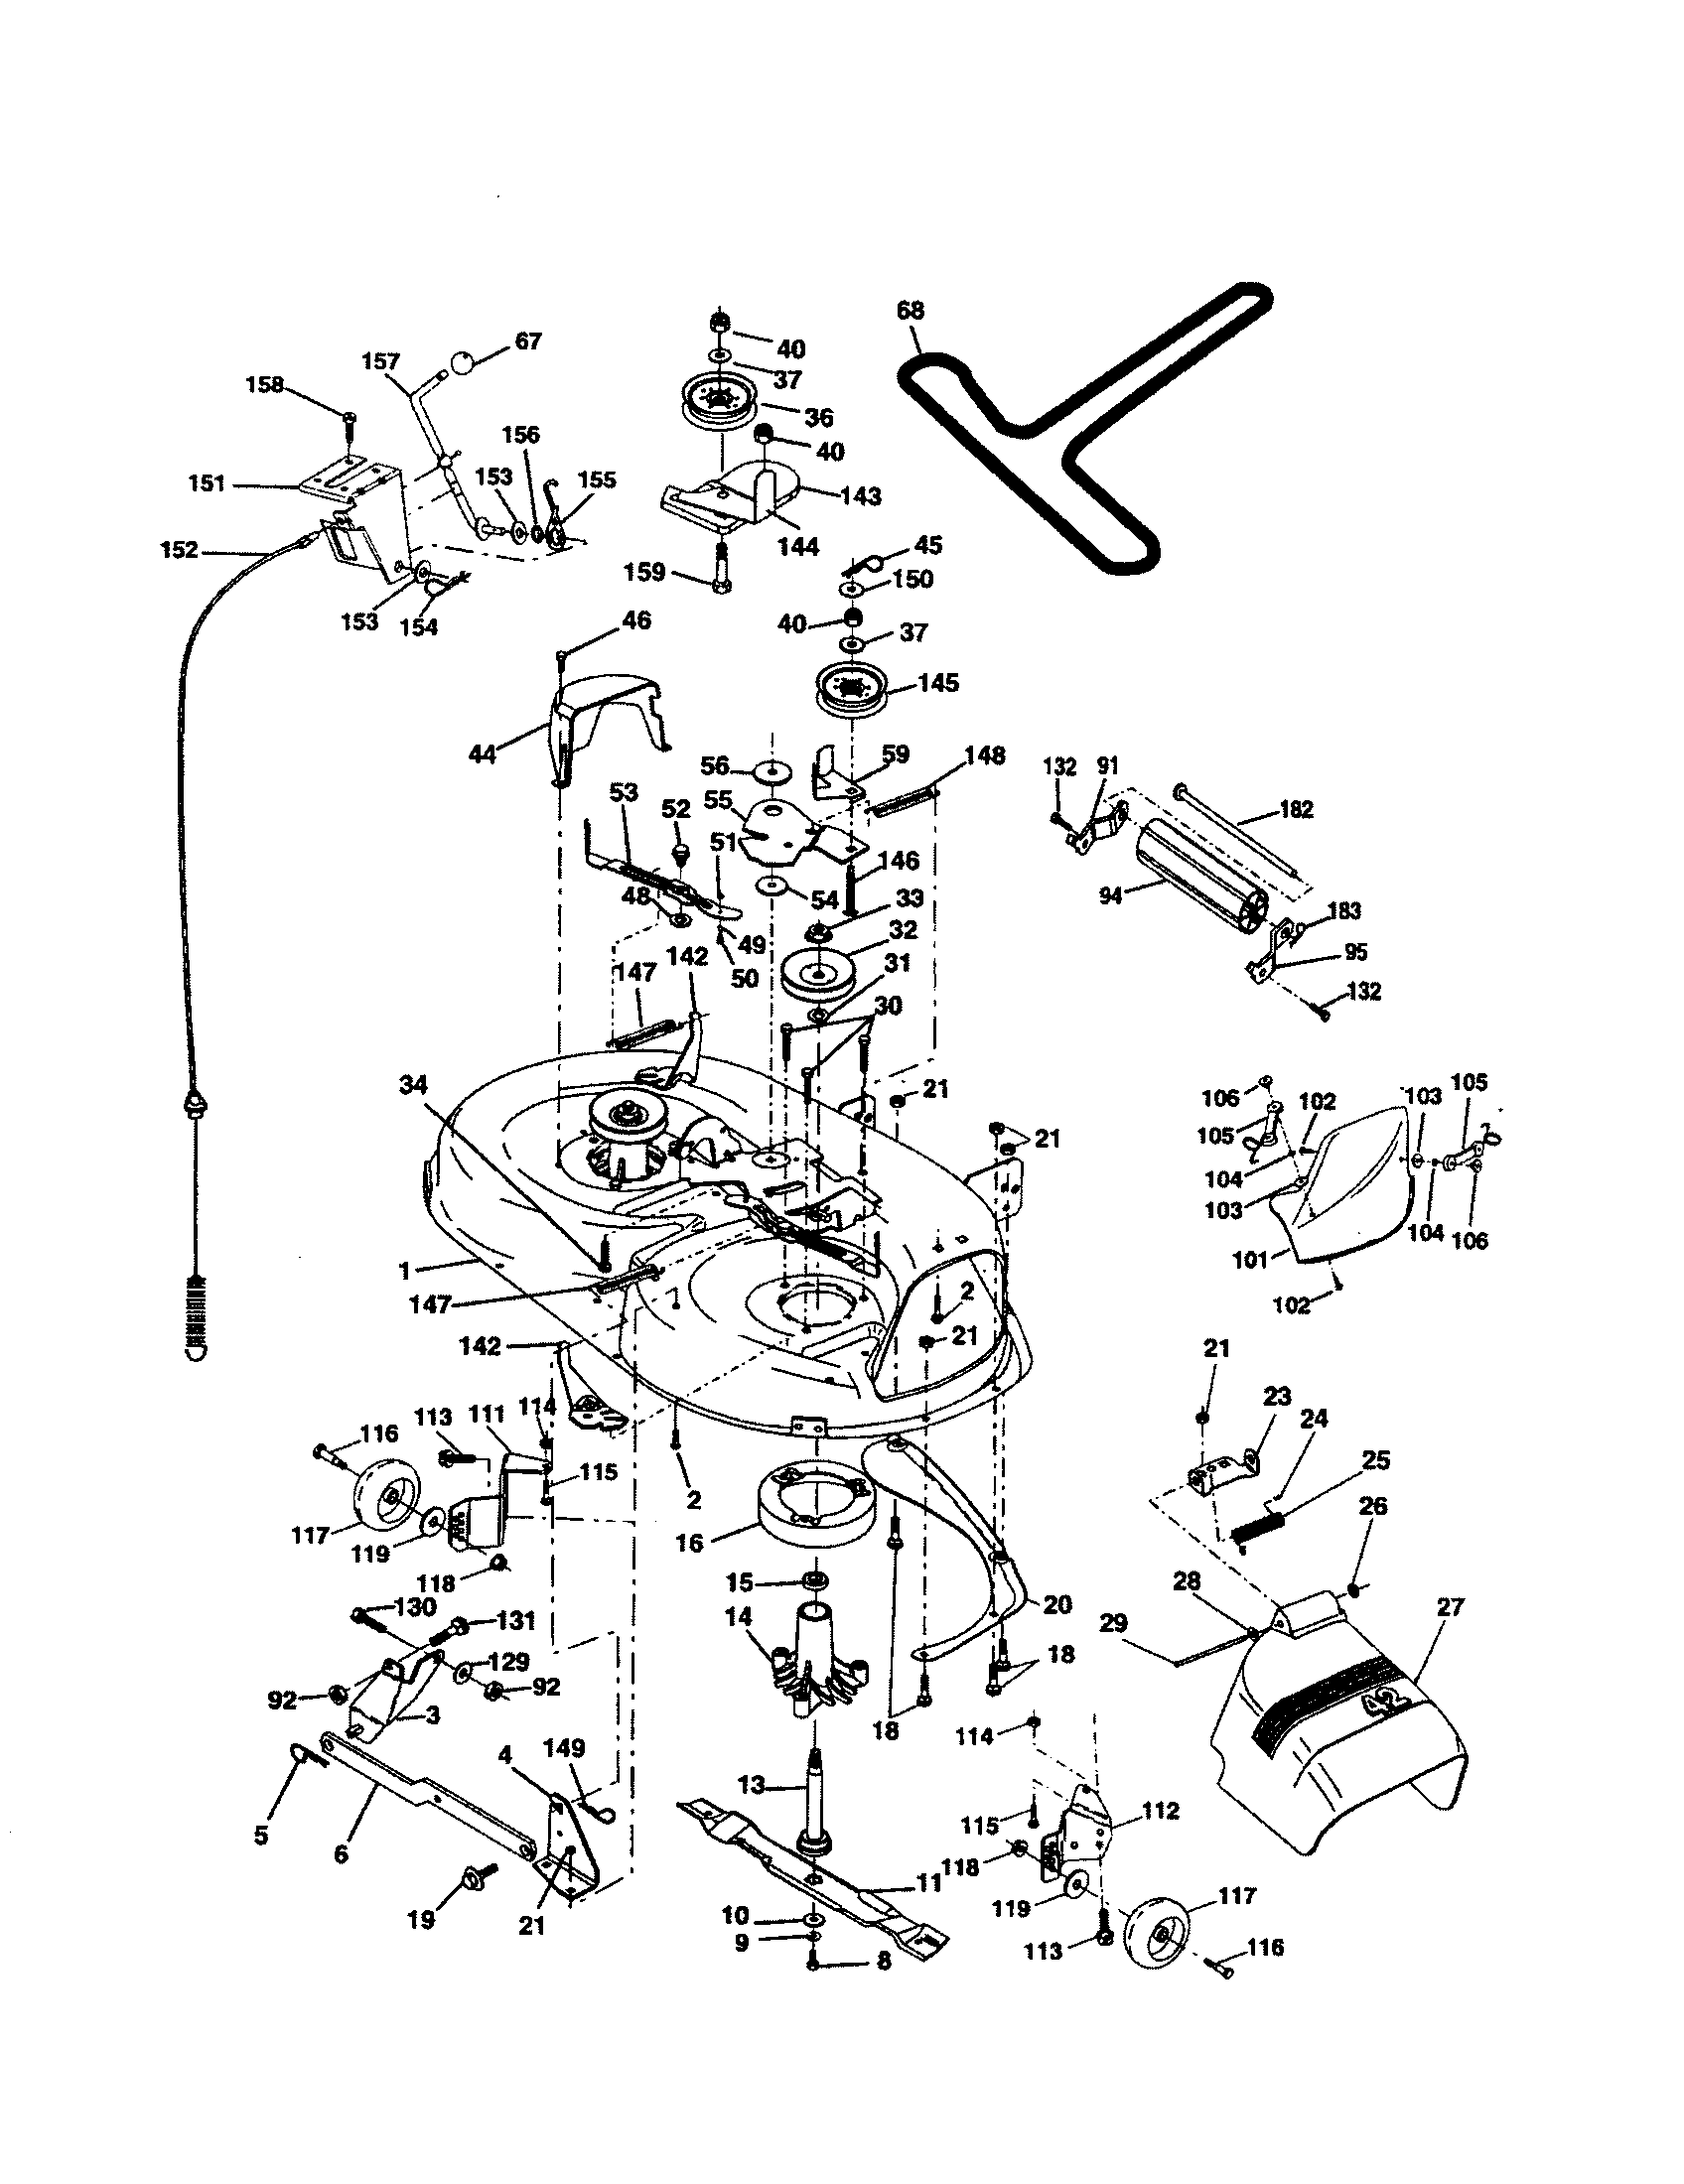 SO_9524] Wiring Diagram Additionally Scott Riding Lawn Mower Drive Belt Diagram  Wiring Diagram